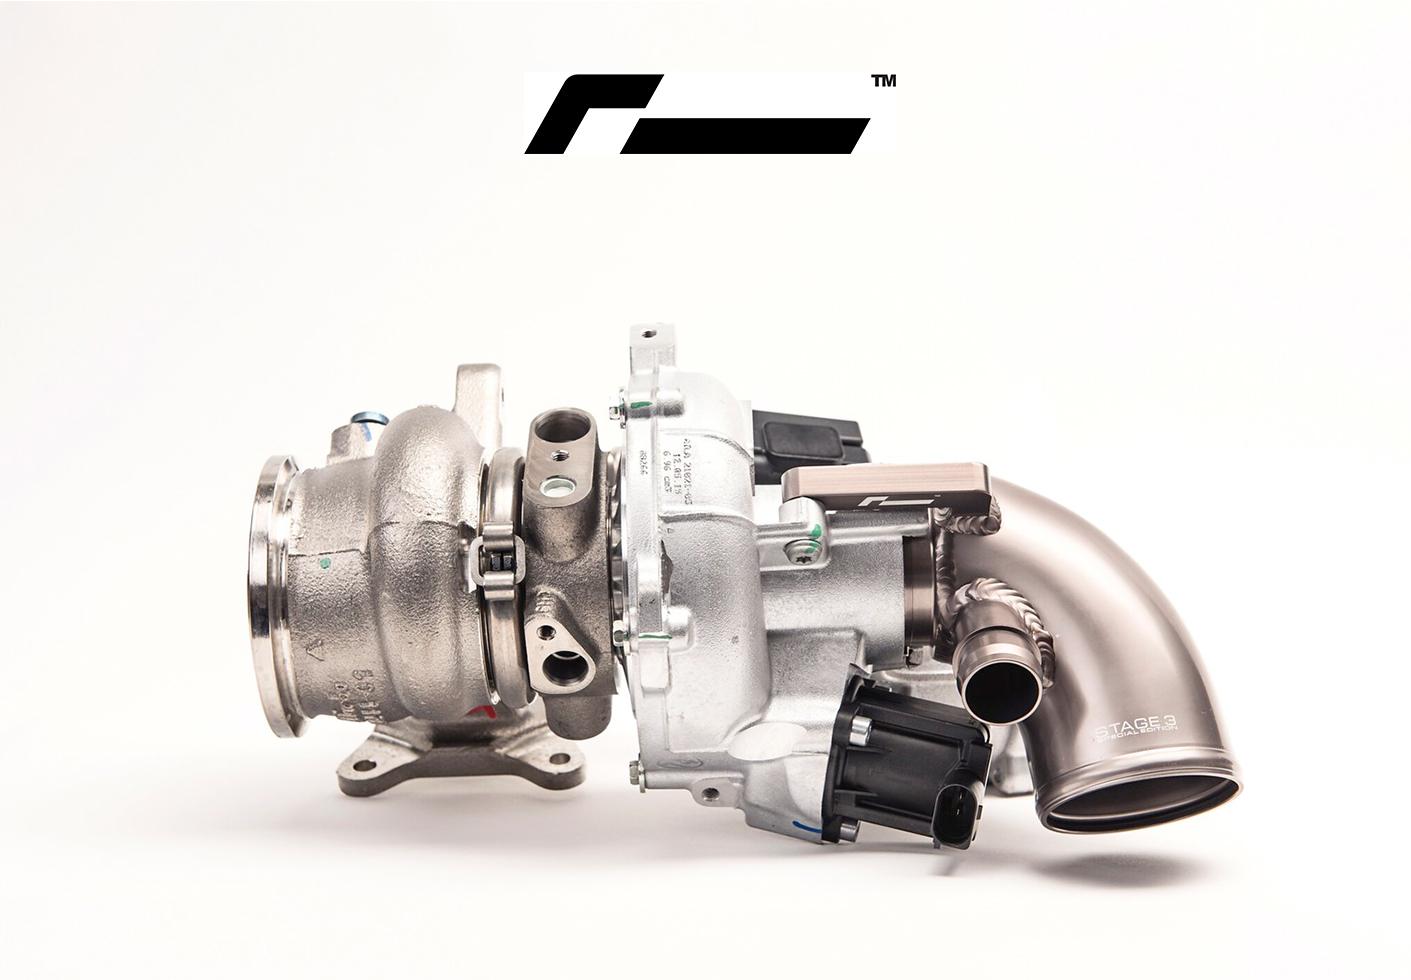 Racingline Stage 3 Turbocharger Kit - MK7 GTI/R, 8V S3, 5E VRS